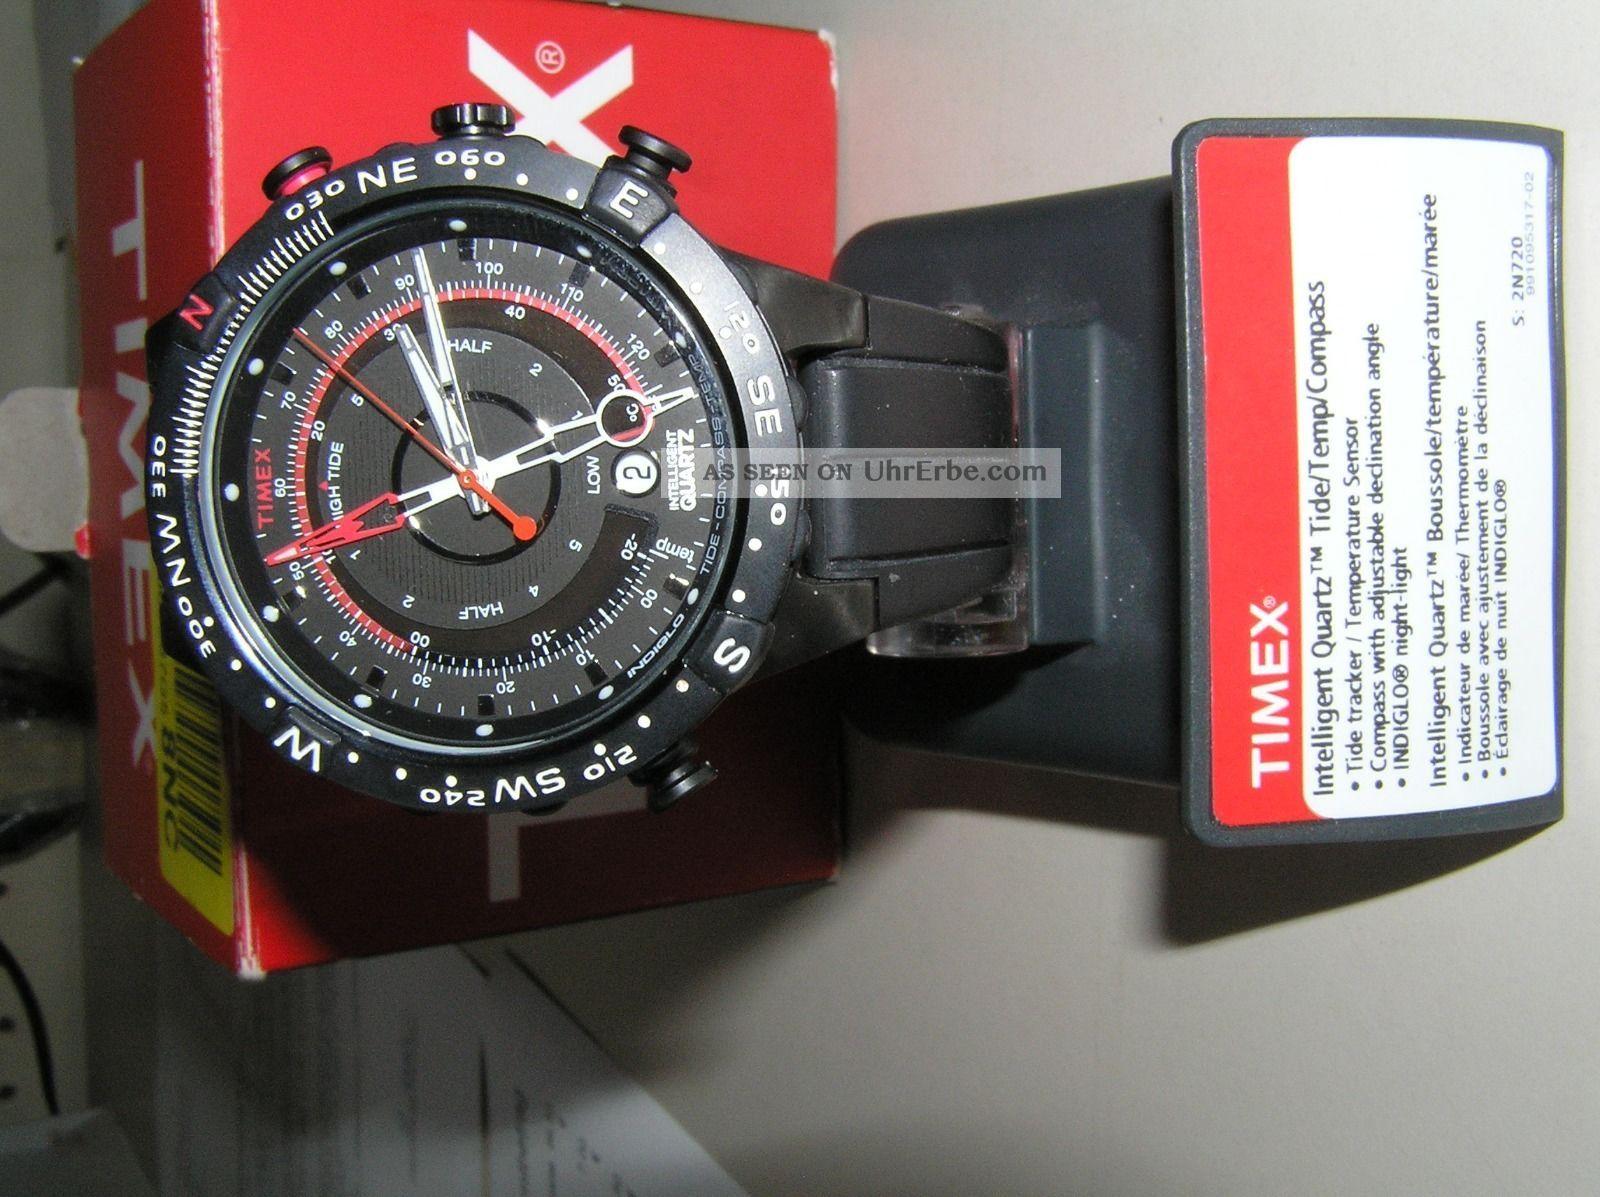 Timex Herrenuhr Intelligent Quartz Tide Temp Compass 2n720 Mit Ovp Armbanduhren Bild